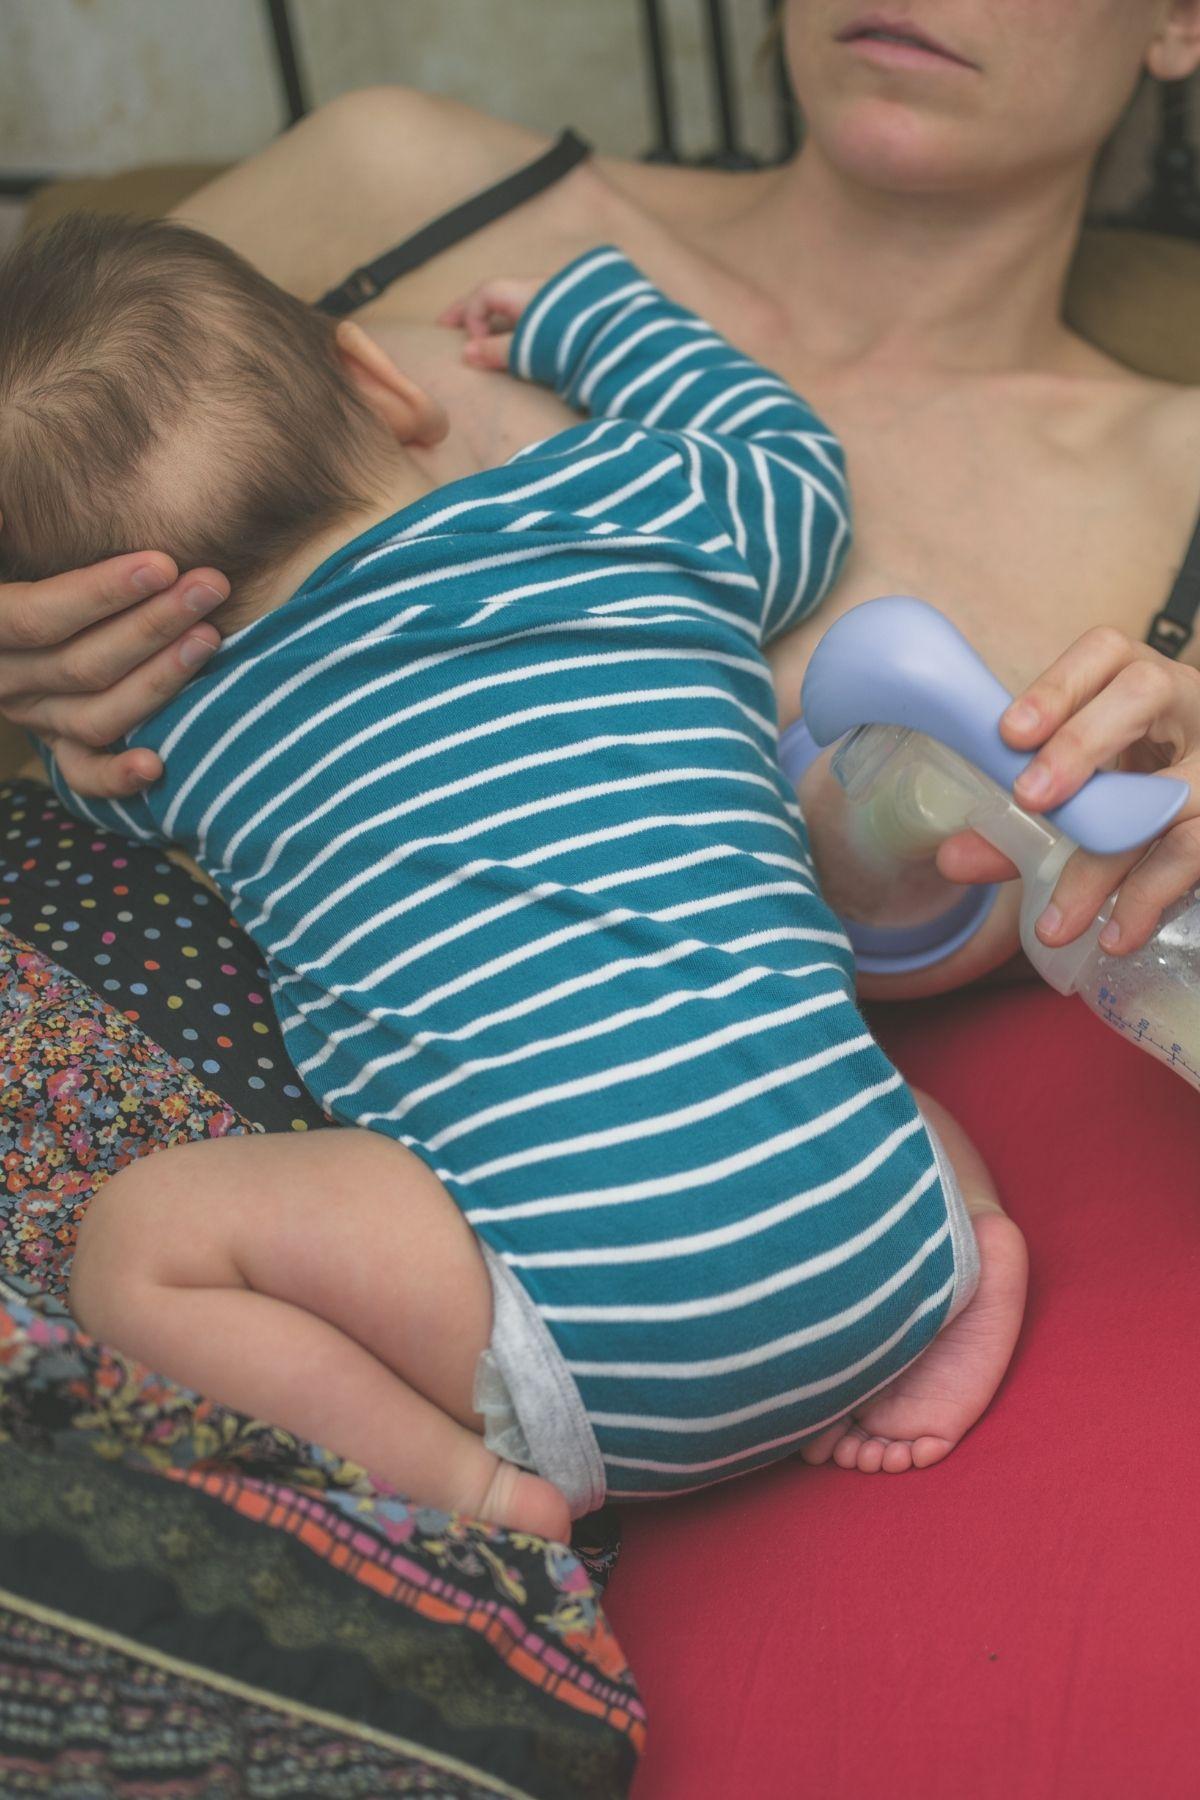 Woman uses handheld pump with breastfeeding baby.